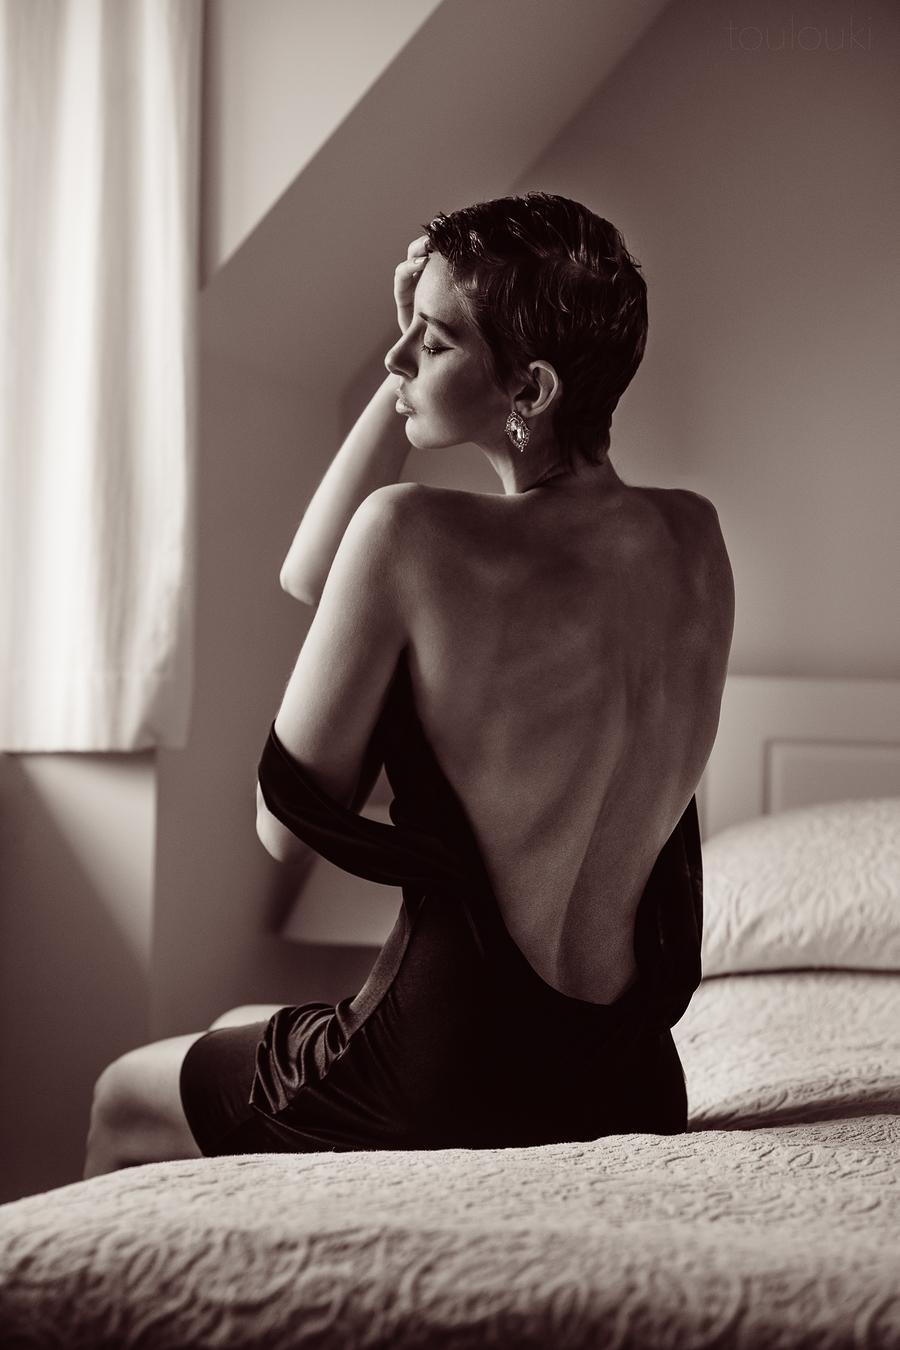 Honey don't / Photography by ❀ Chiara Elisabetta, Model ❀ Chiara Elisabetta / Uploaded 24th November 2019 @ 08:40 PM